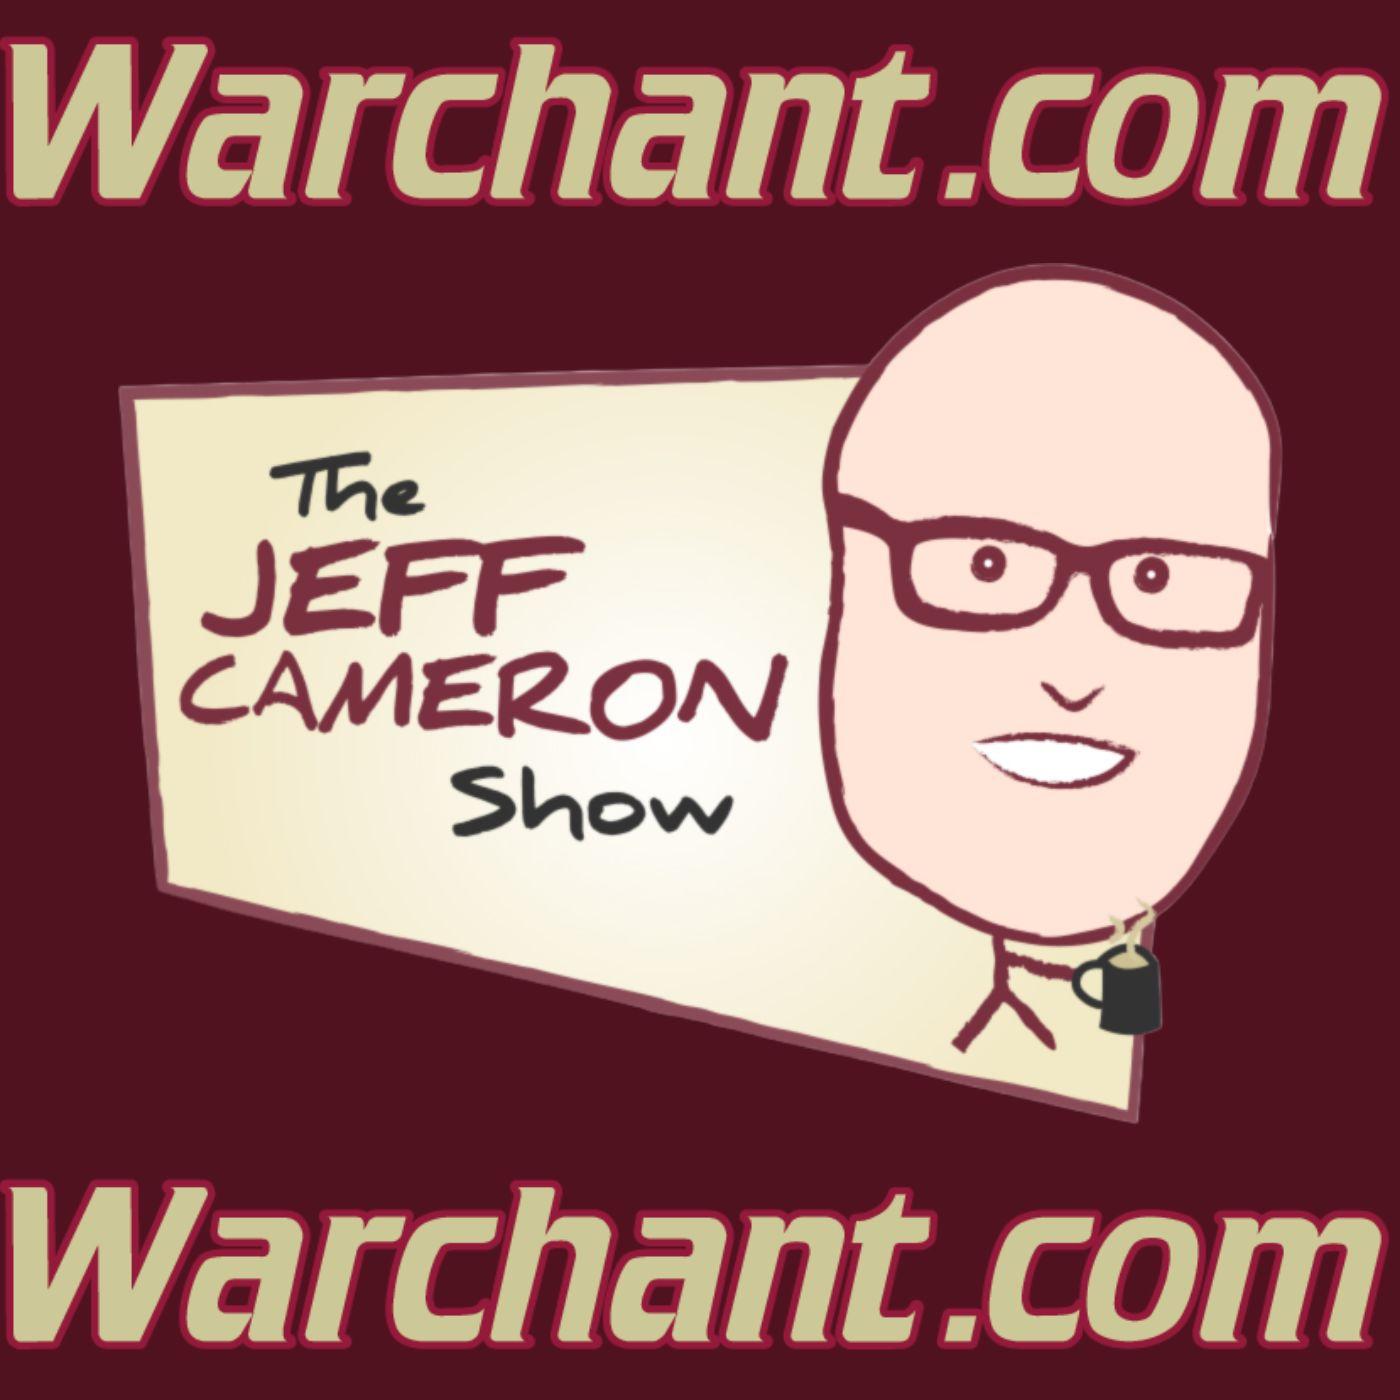 The Jeff Cameron Show